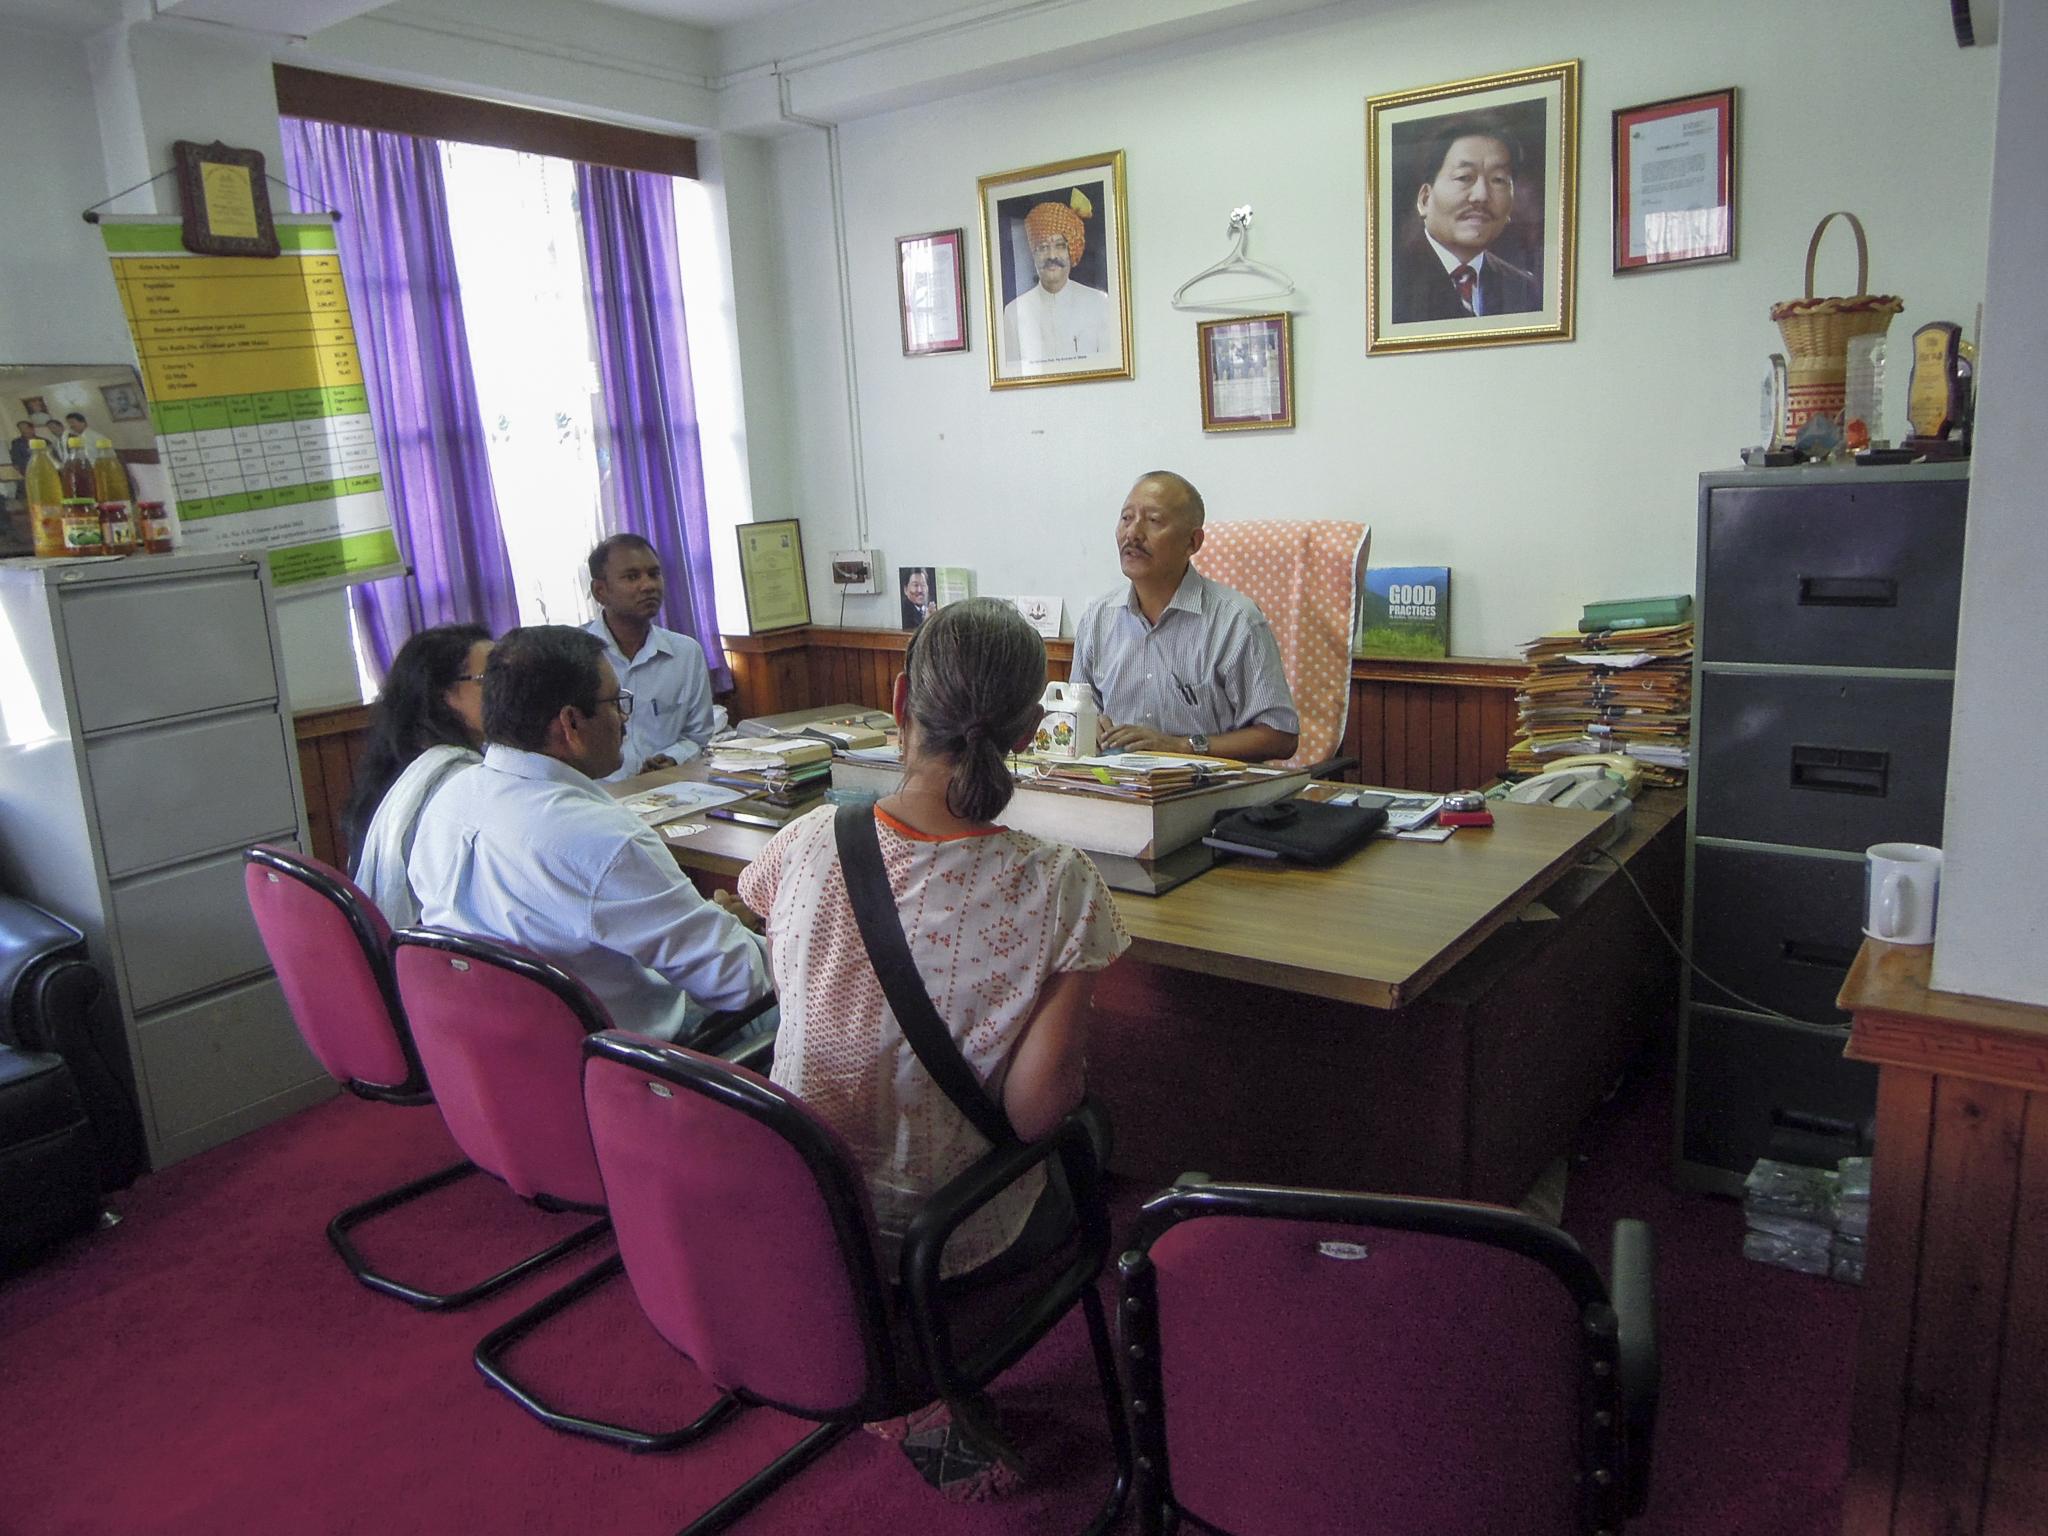 Indien Sikkim organic mission 100% Bio Forschungs-Sabbatical organic17